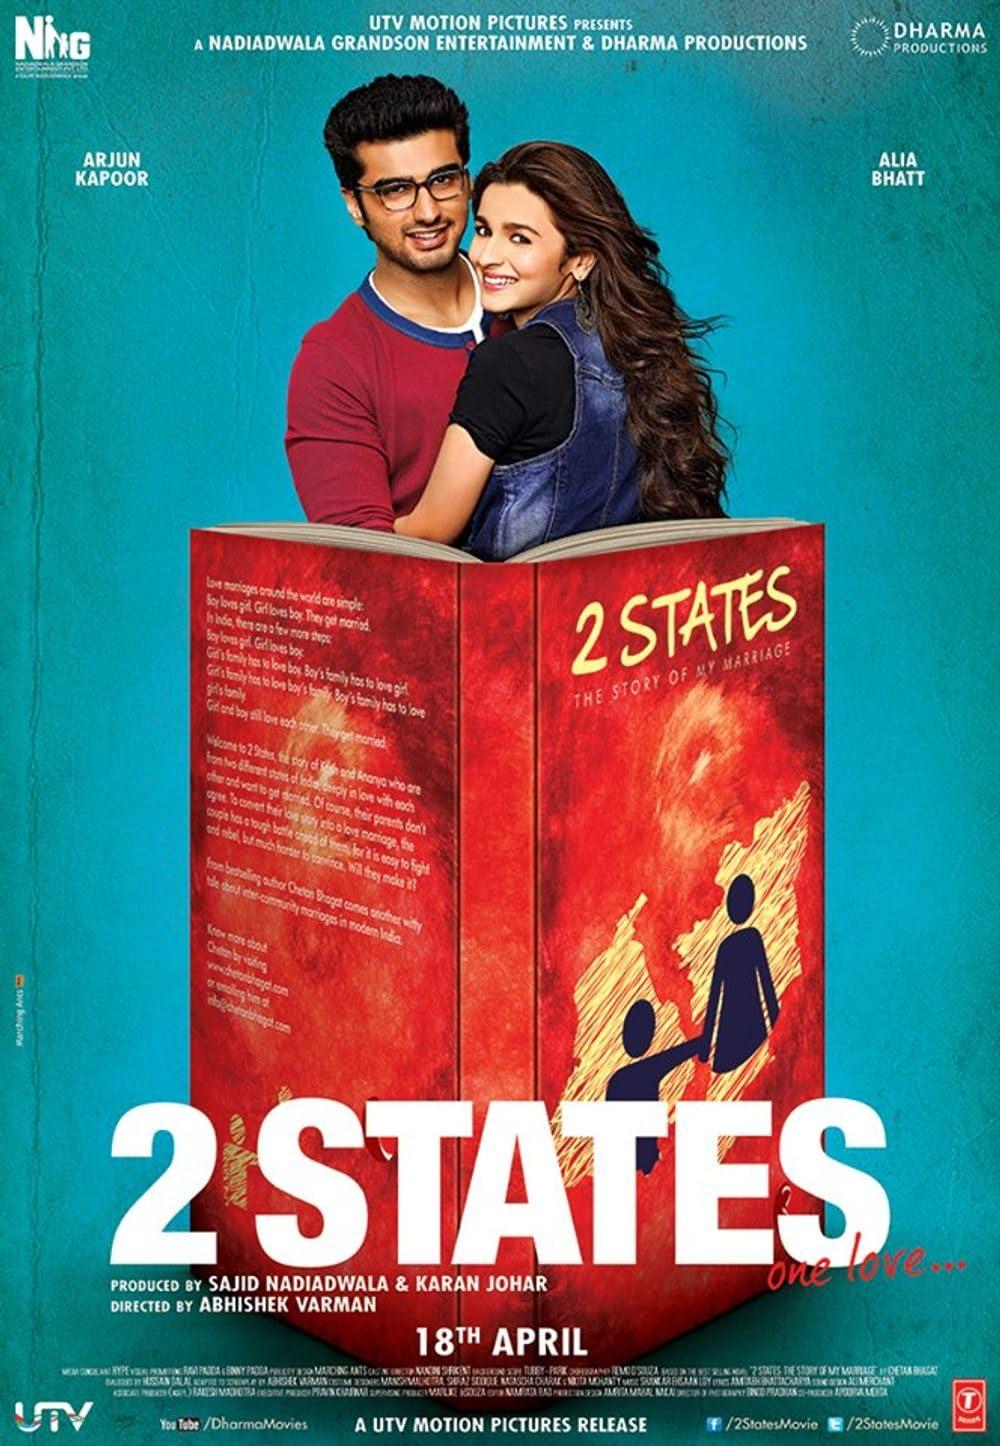 2 States (2014) Hindi Movie 1080p BluRay x264 AAC 1.7GB Download